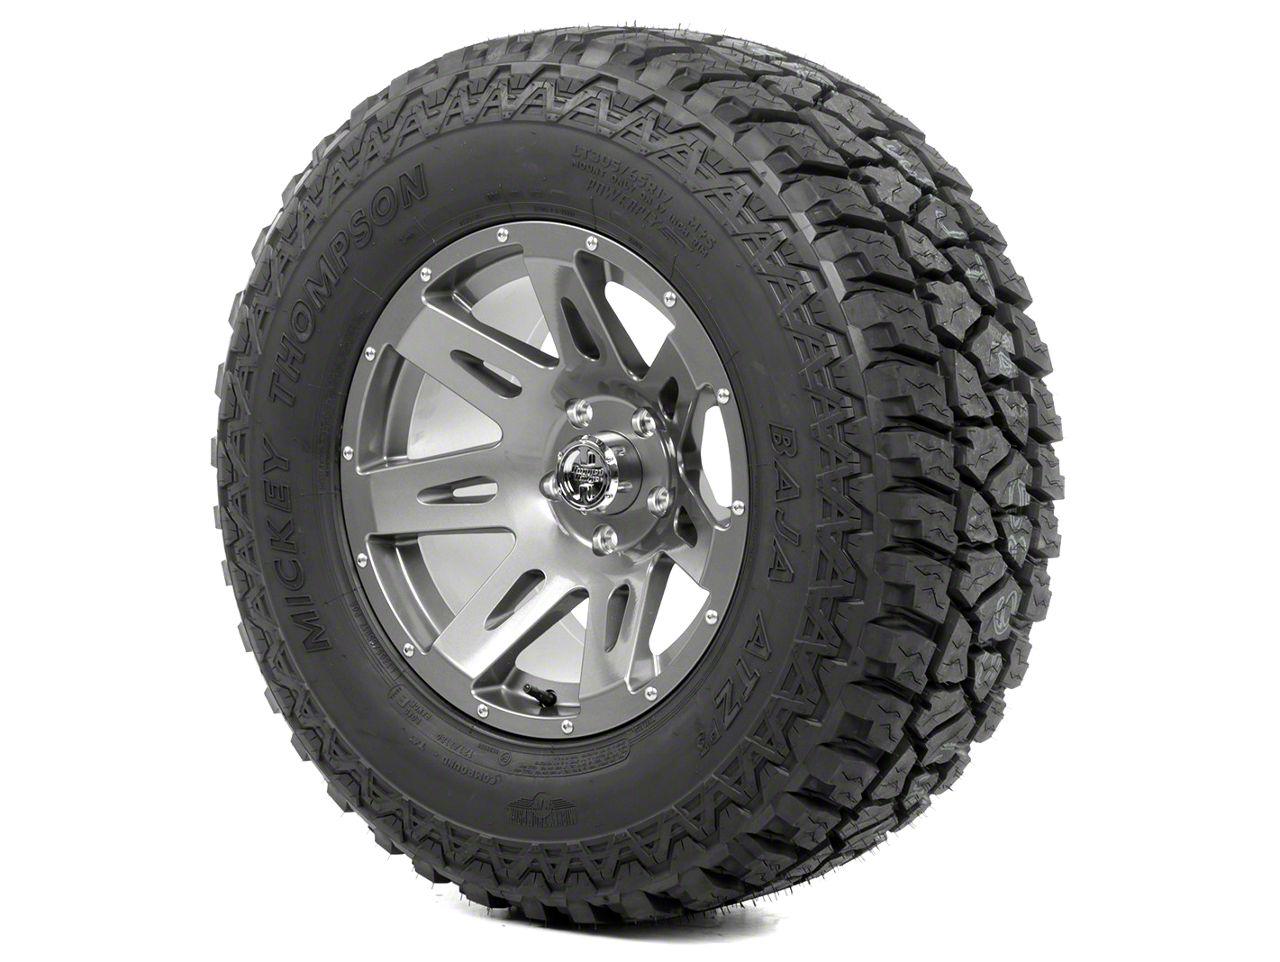 Rugged Ridge XHD Wheel 17x9 Gun Metal and Mickey Thompson ATZ P3 305/65R17 Tire Kit (07-18 Jeep Wrangler JK)